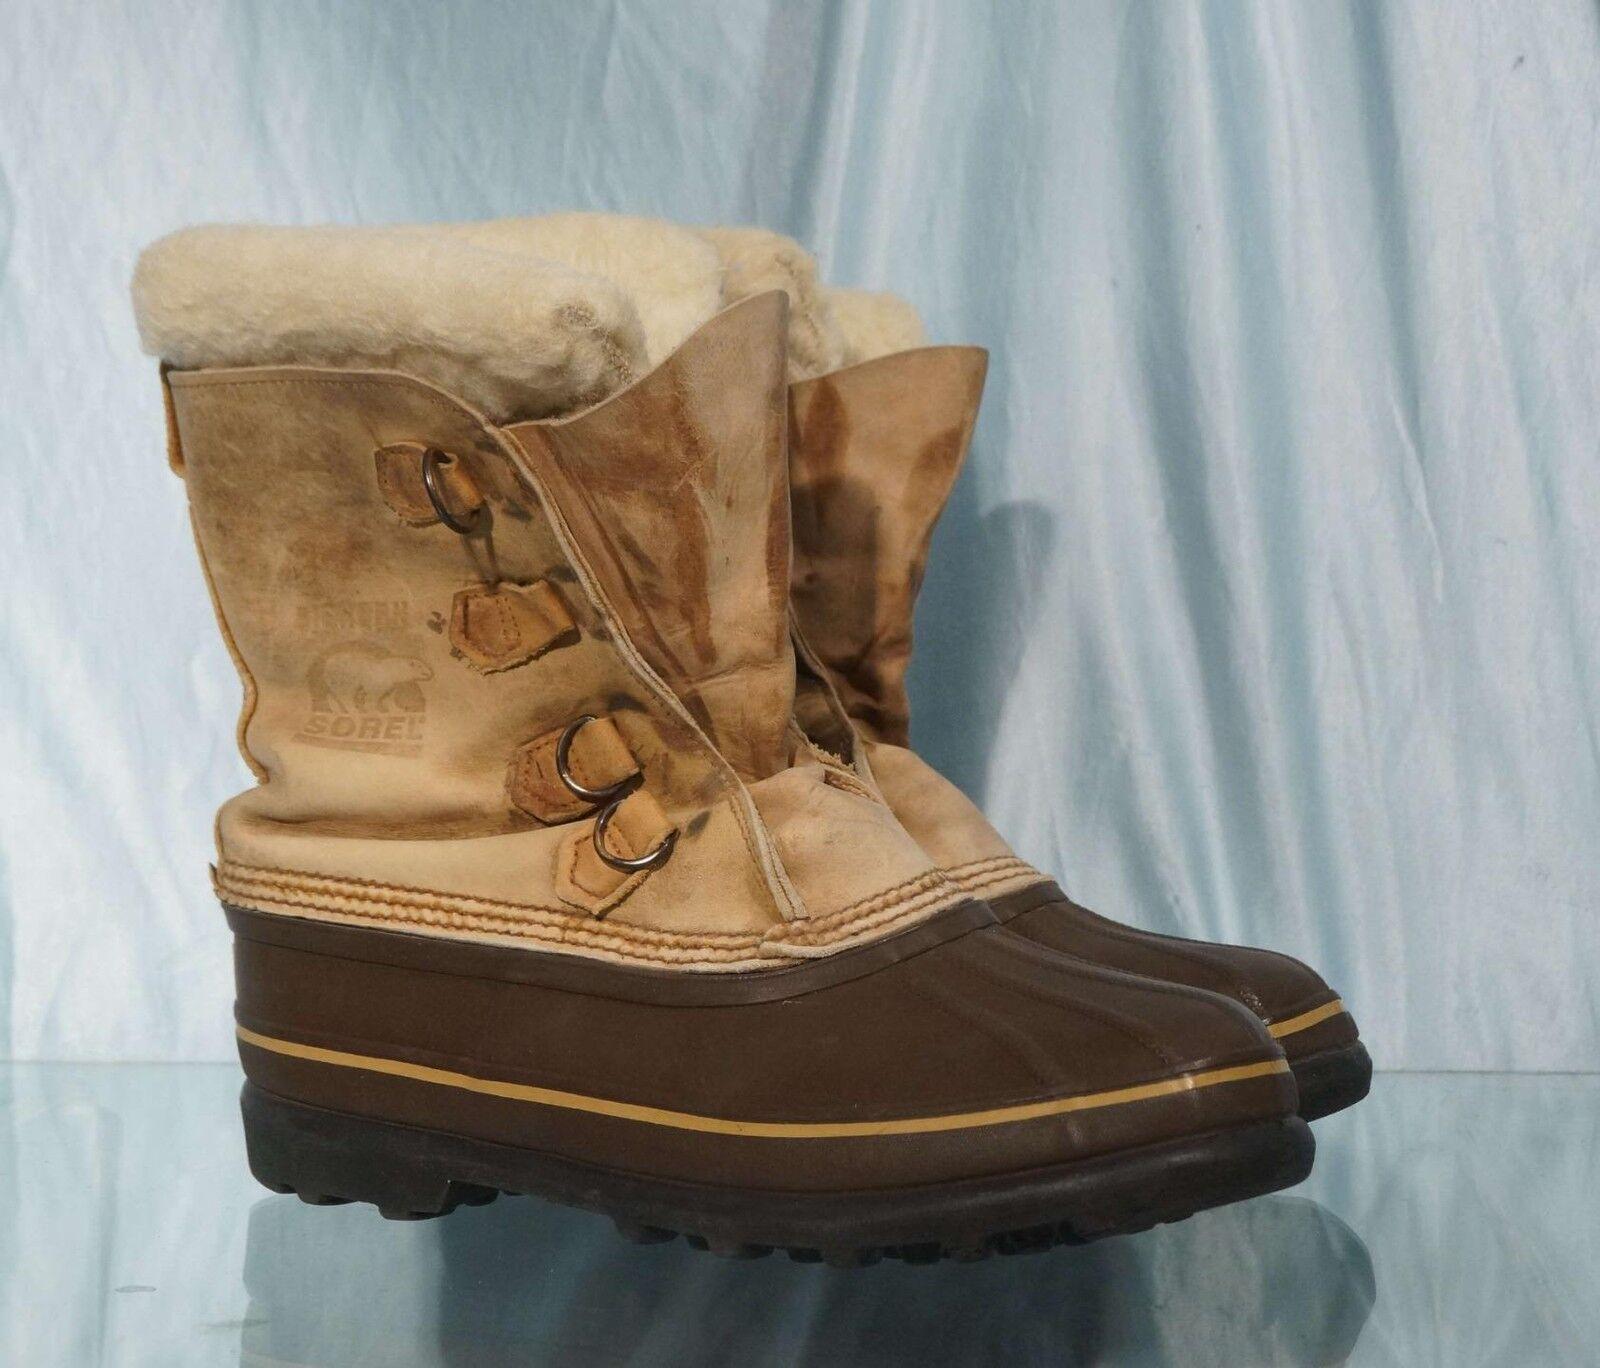 Vintage Light braun SOREL BIGHORN Snow Winter Stiefel Sz 9